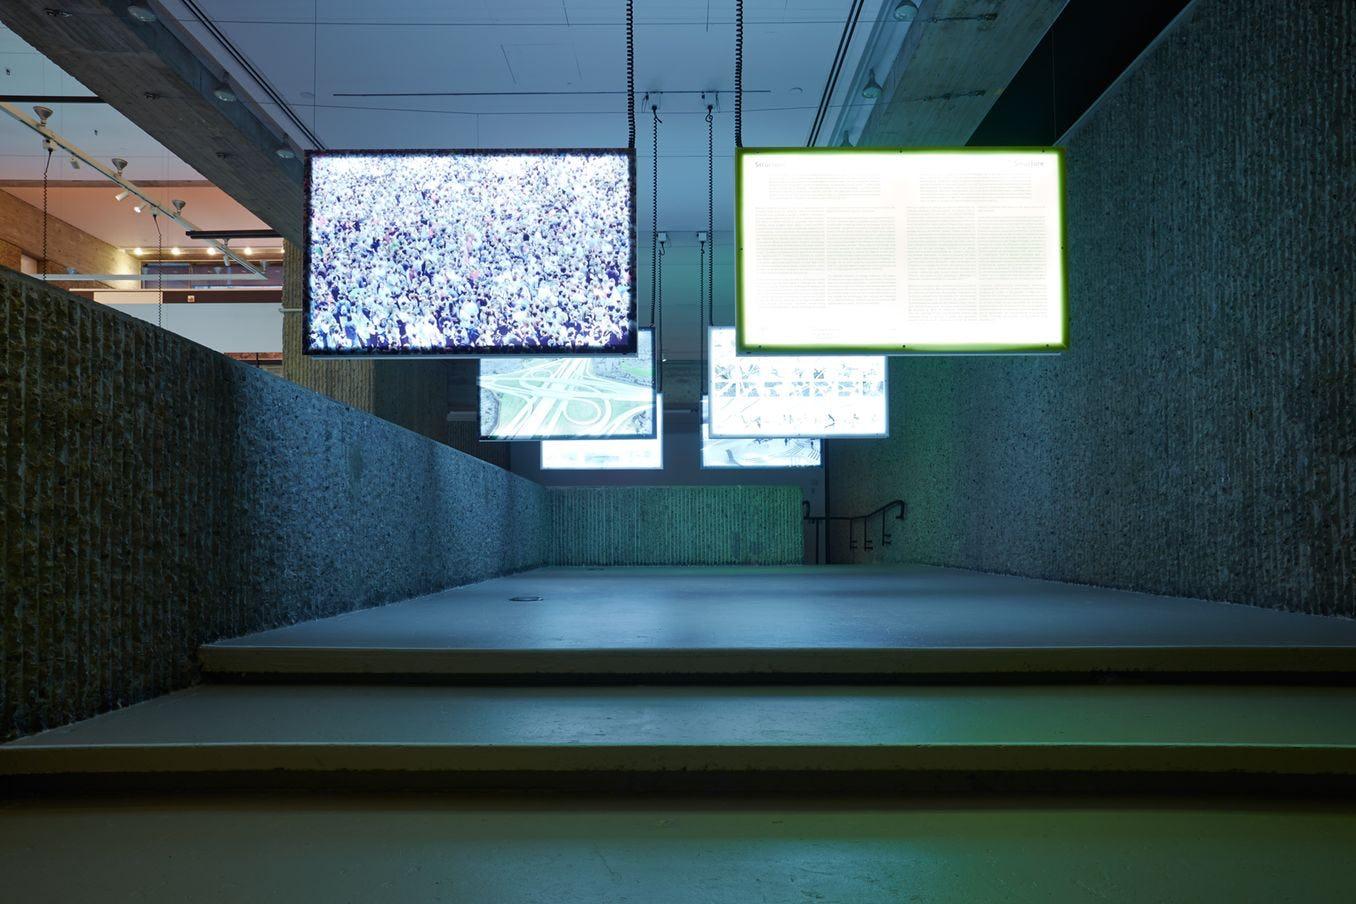 Infra eco logi urbanism yale 07